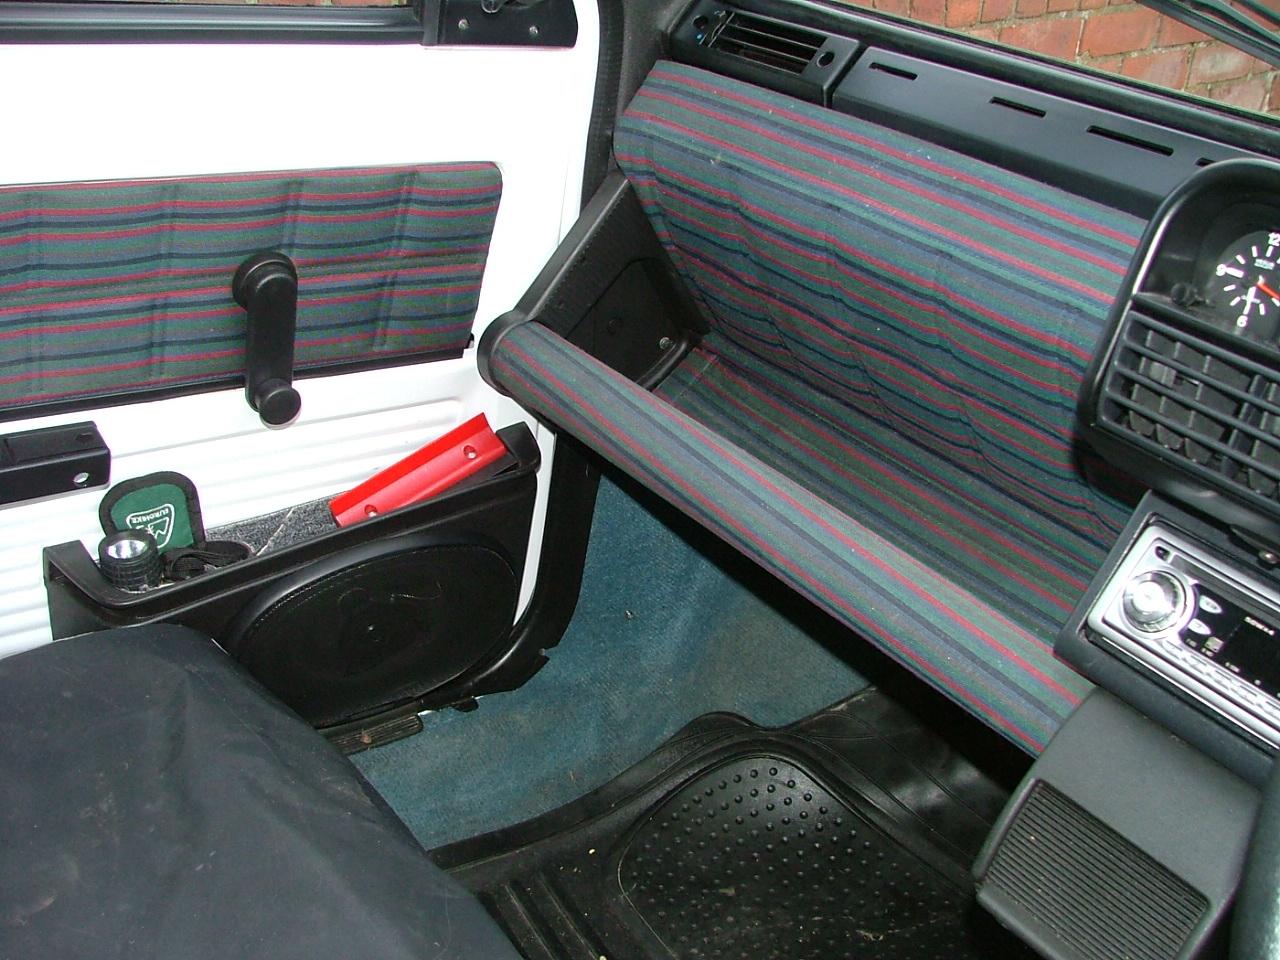 Fiat Panda 4x4 1990 Interior The Fiat Forum Photo Gallery